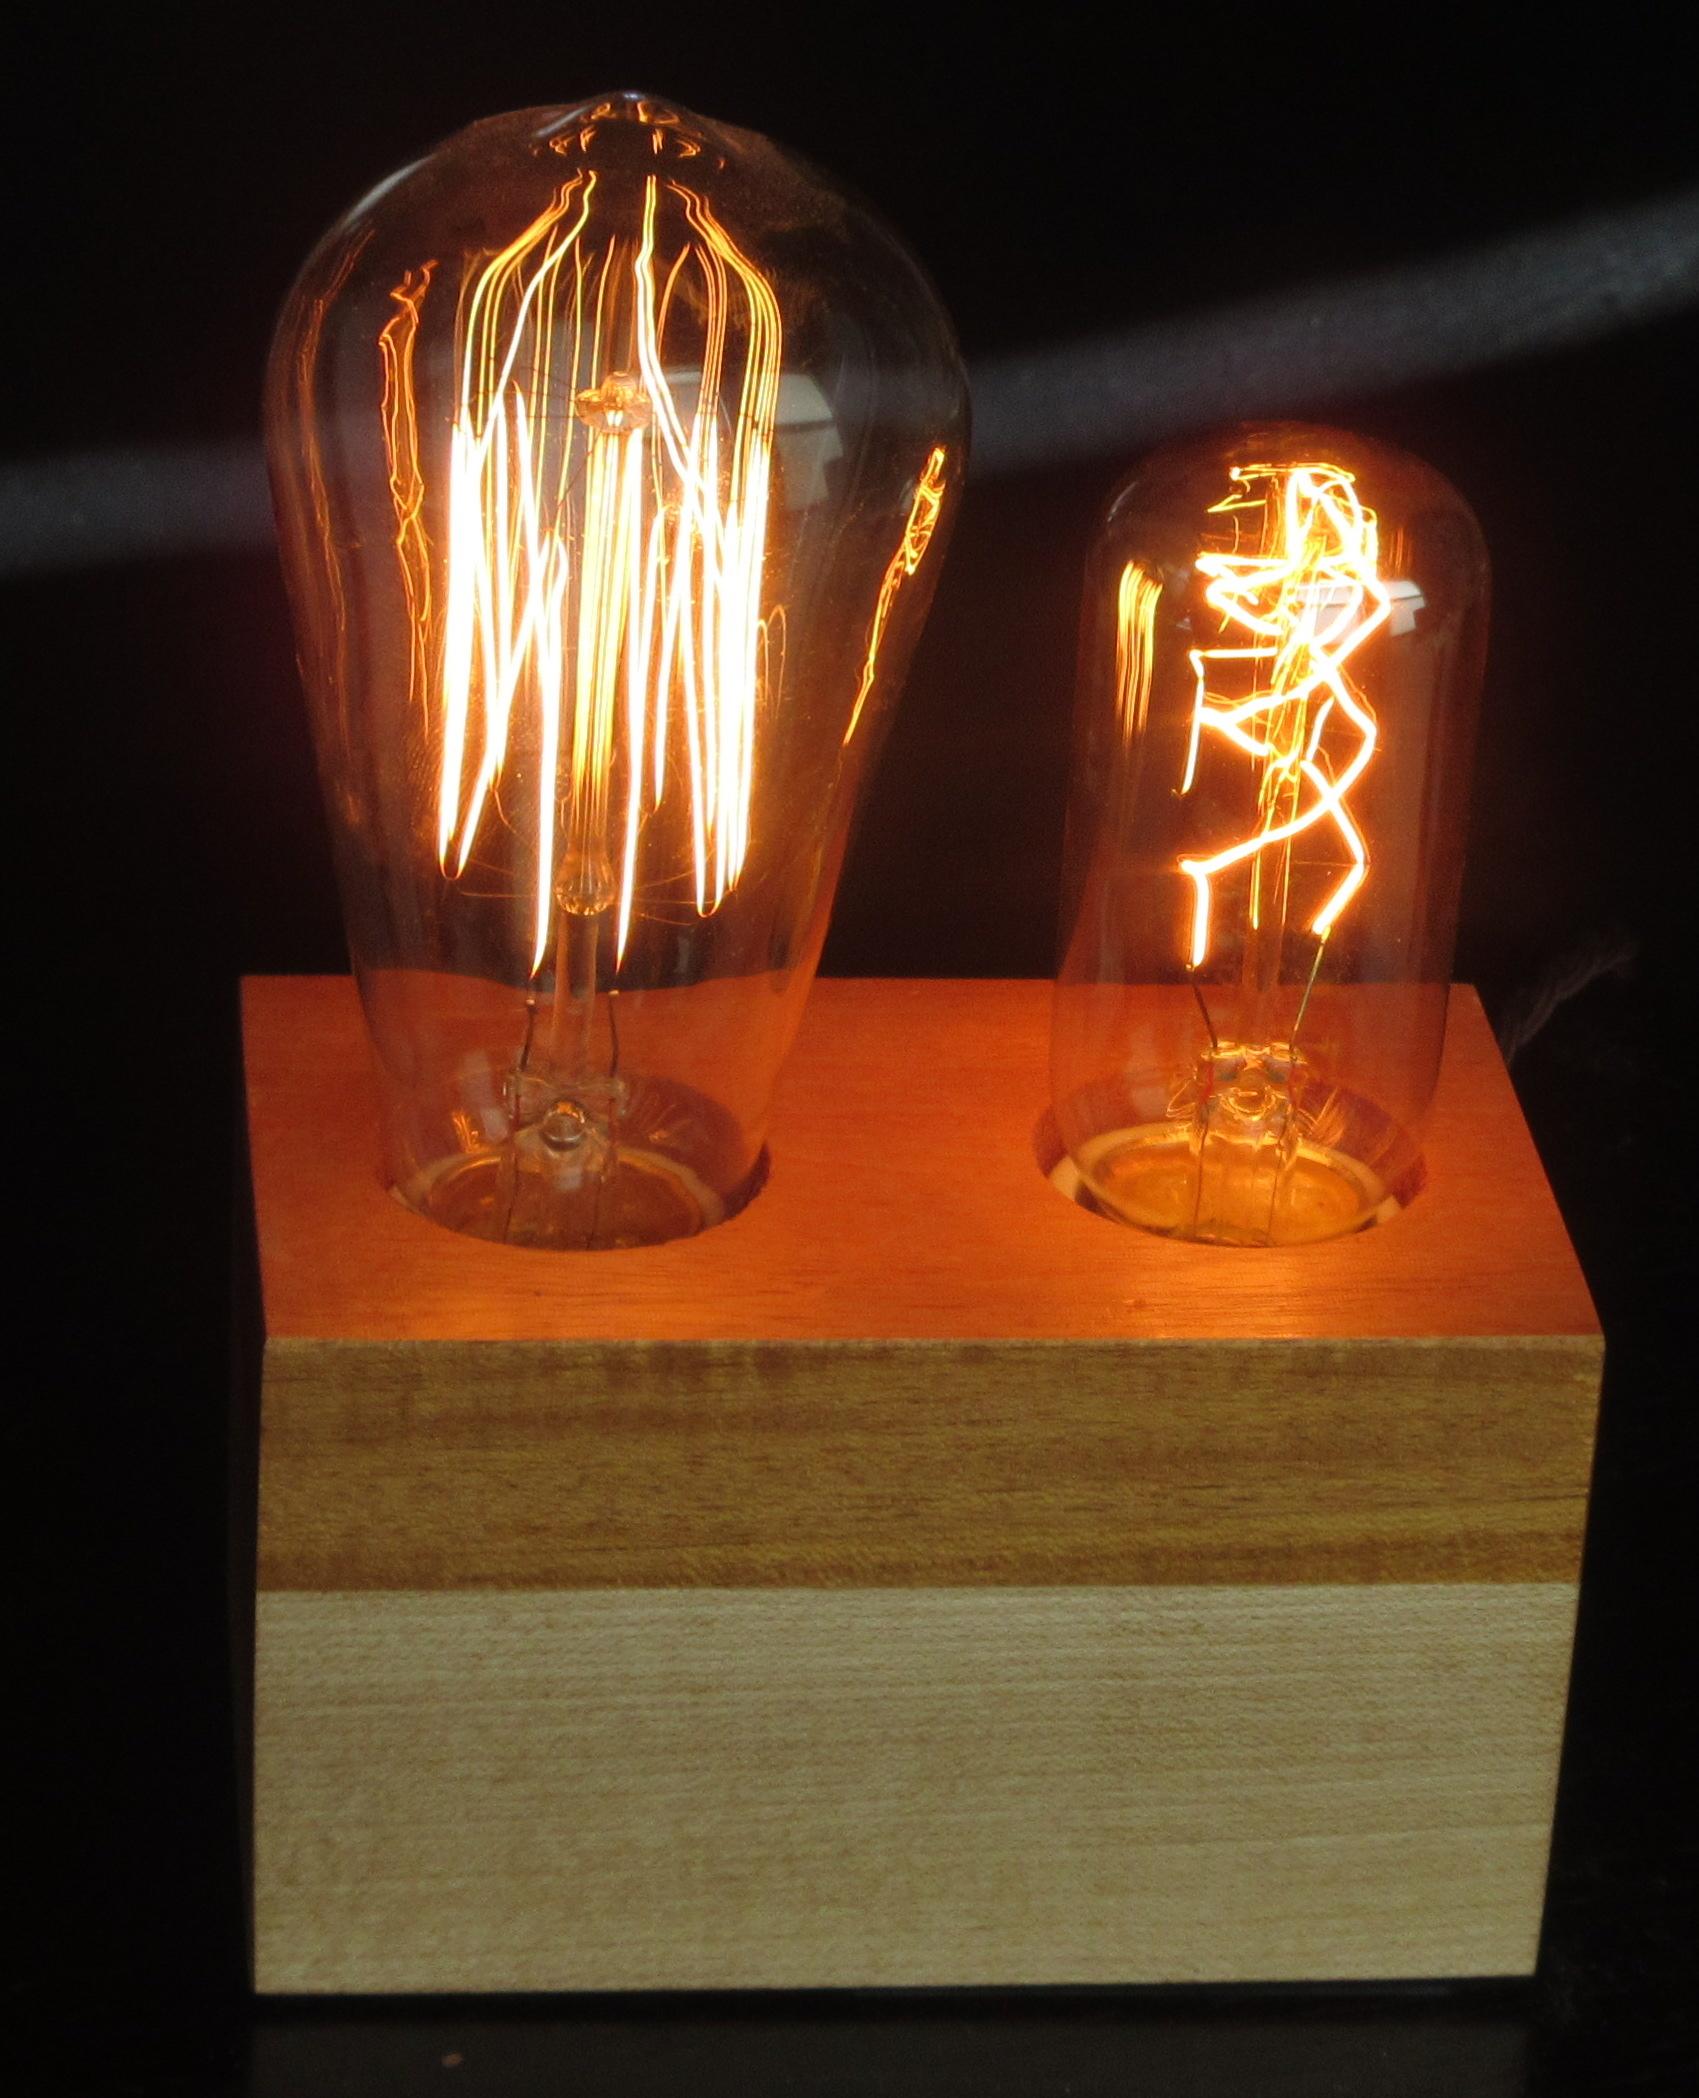 Mahogany and Maple - 2 lamps